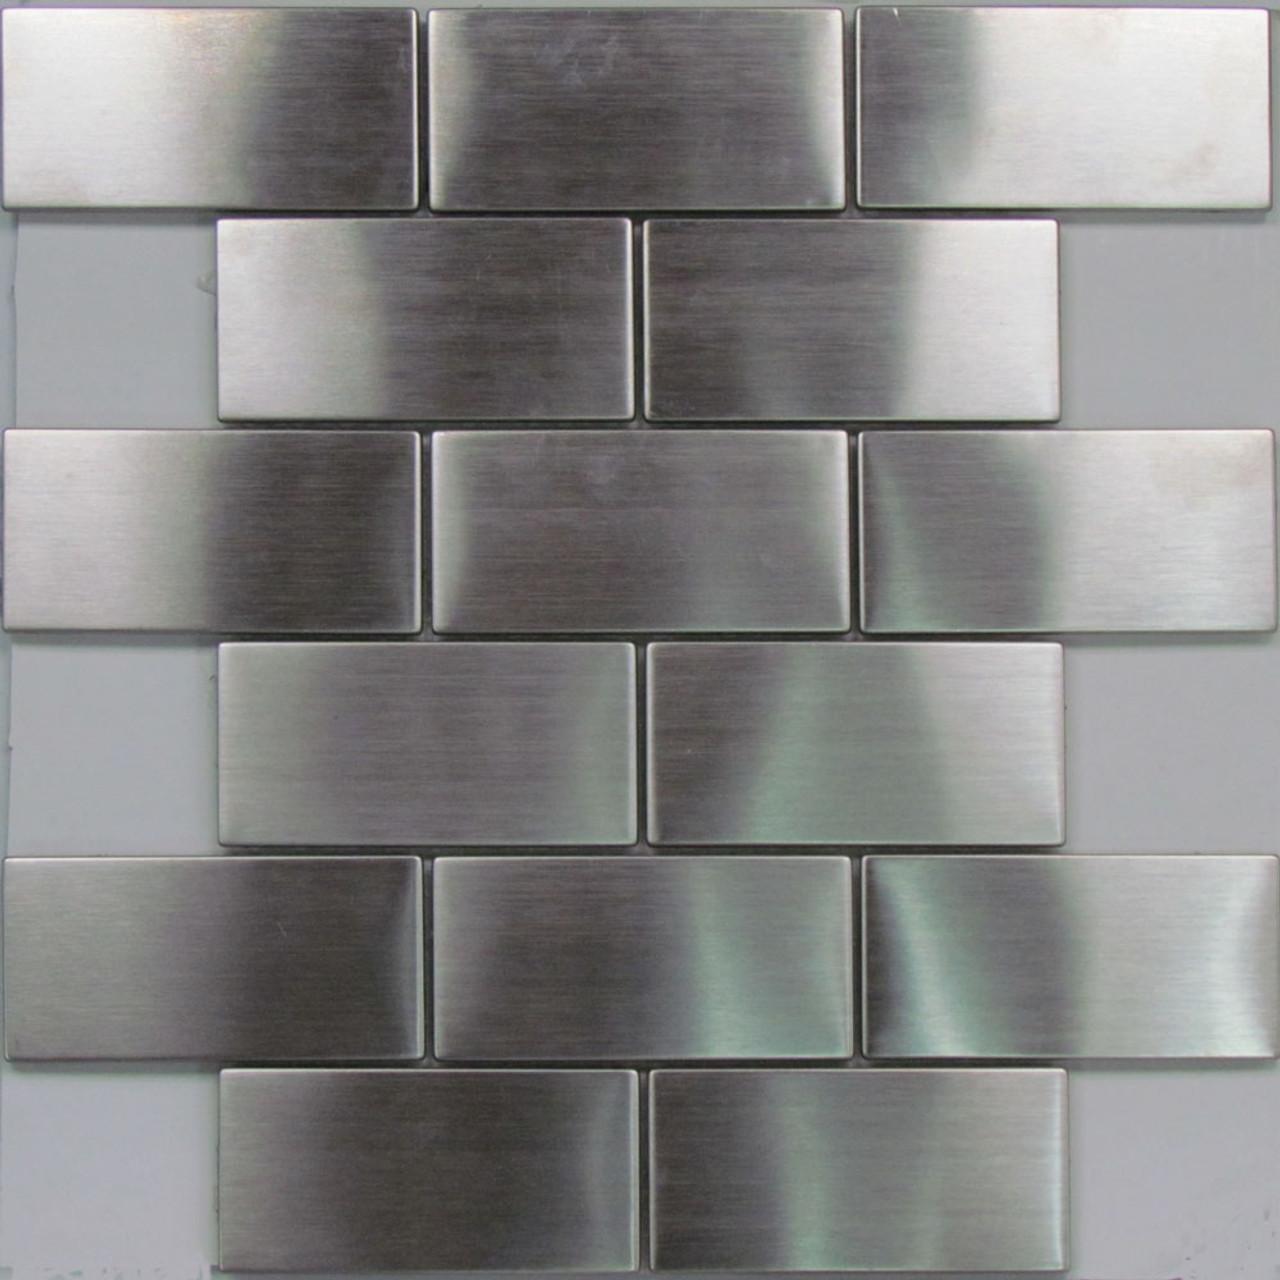 801 stainless steel subway mosaic tiles